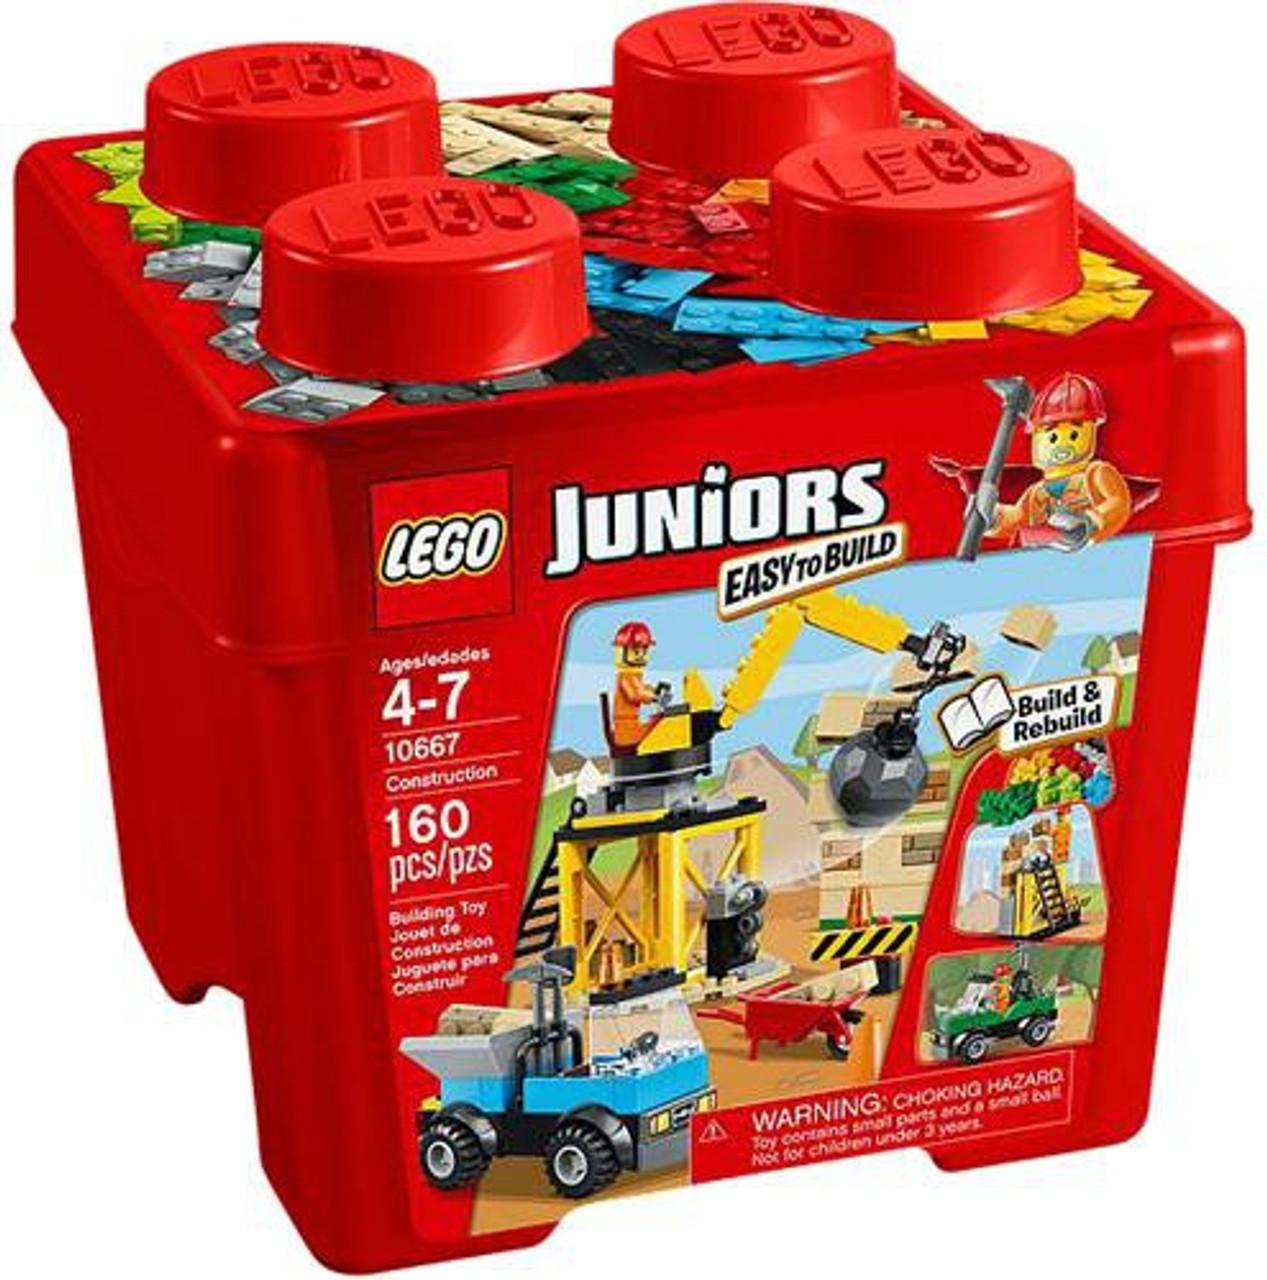 LEGO Juniors Construction Set #10667